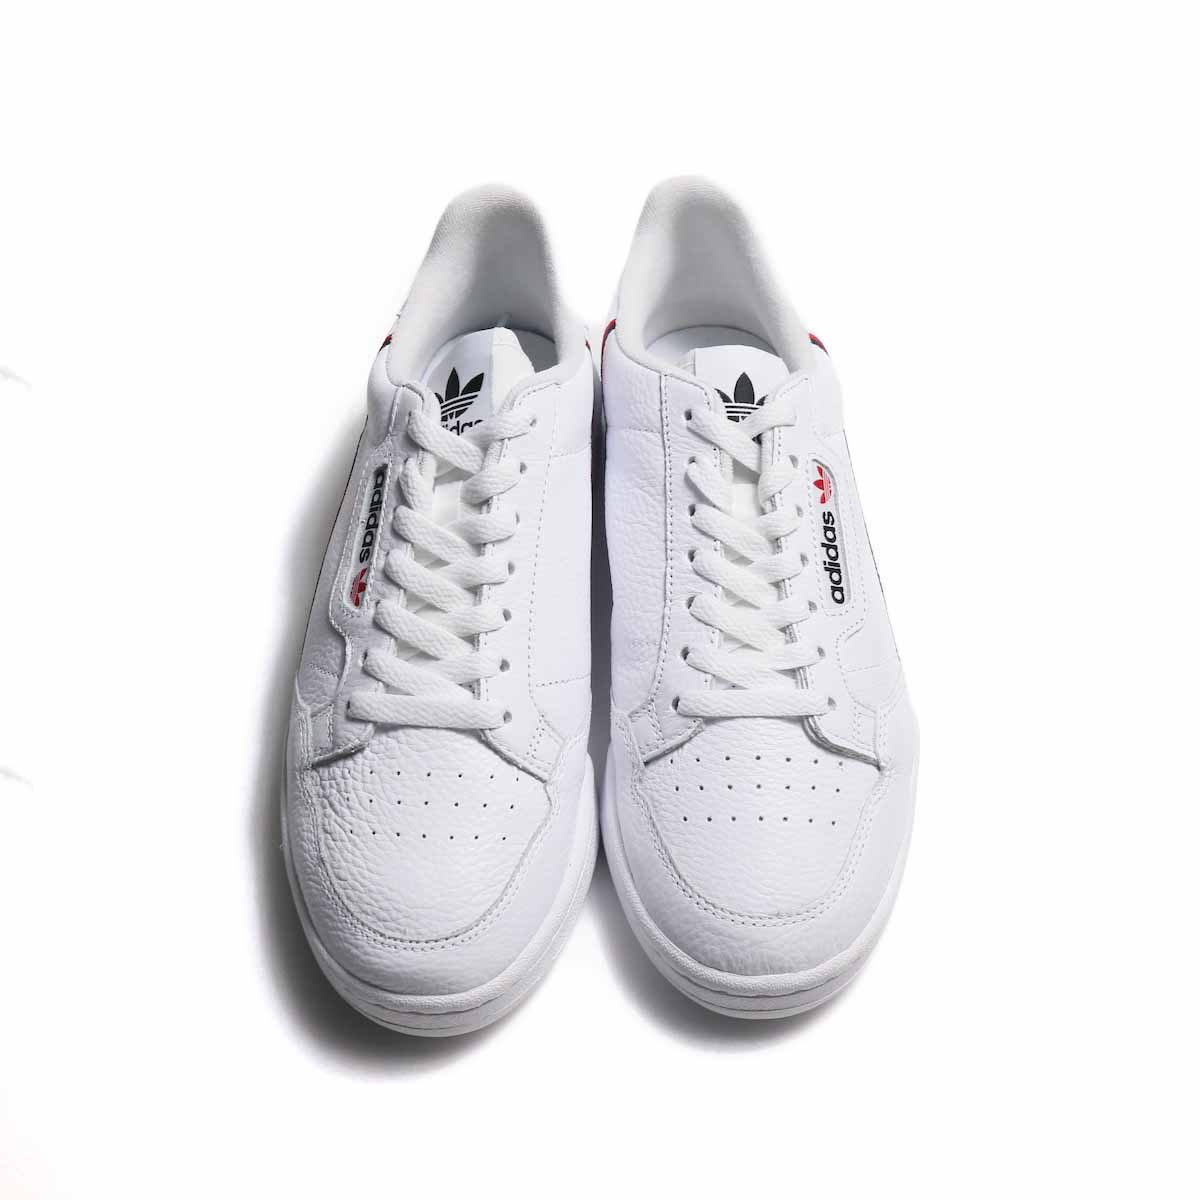 adidas originals / CONTINENTAL80 (G27706) -White 正面